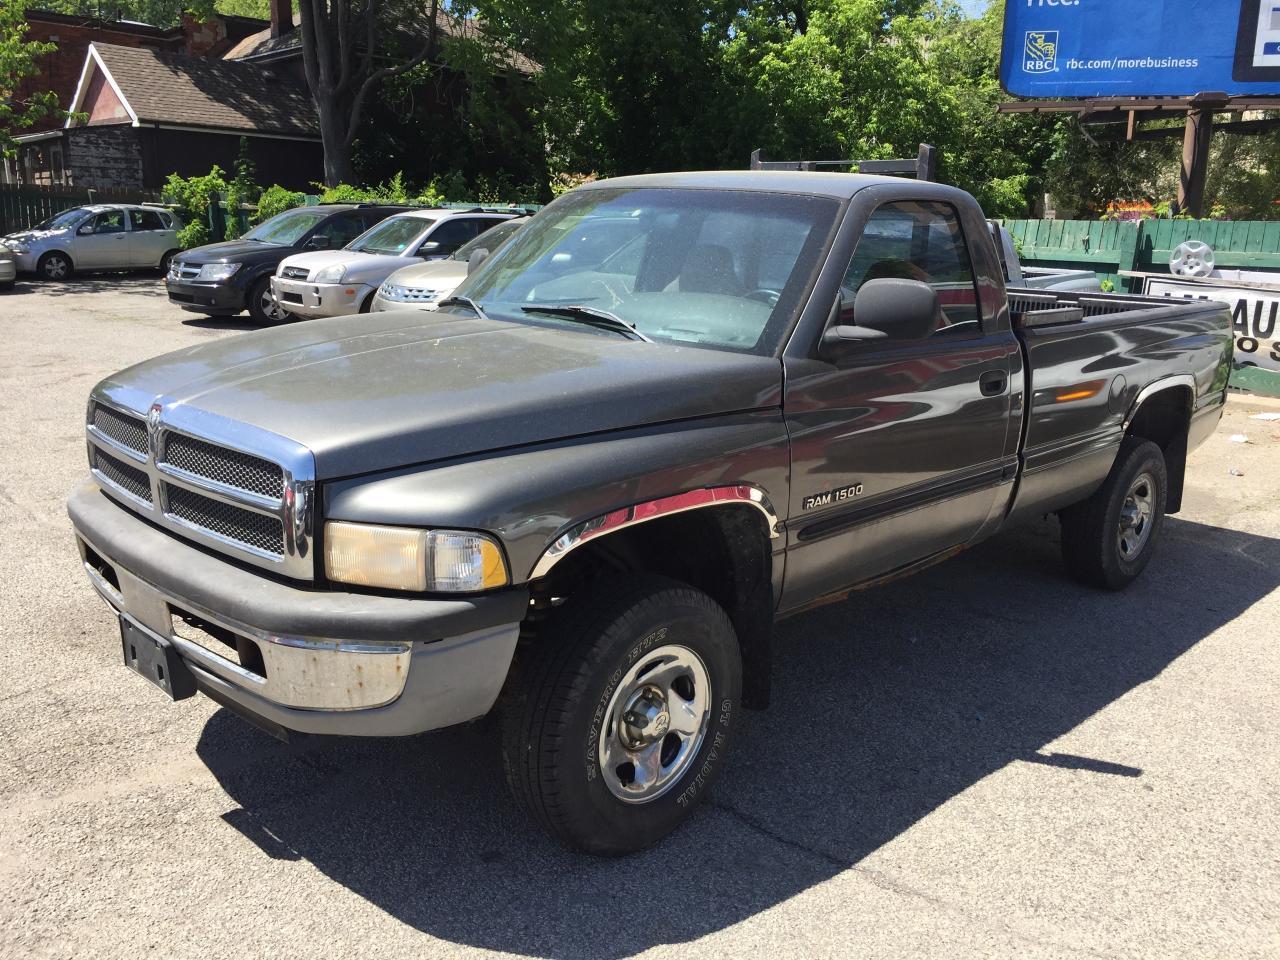 Photo of Gray 1998 Dodge Ram 1500